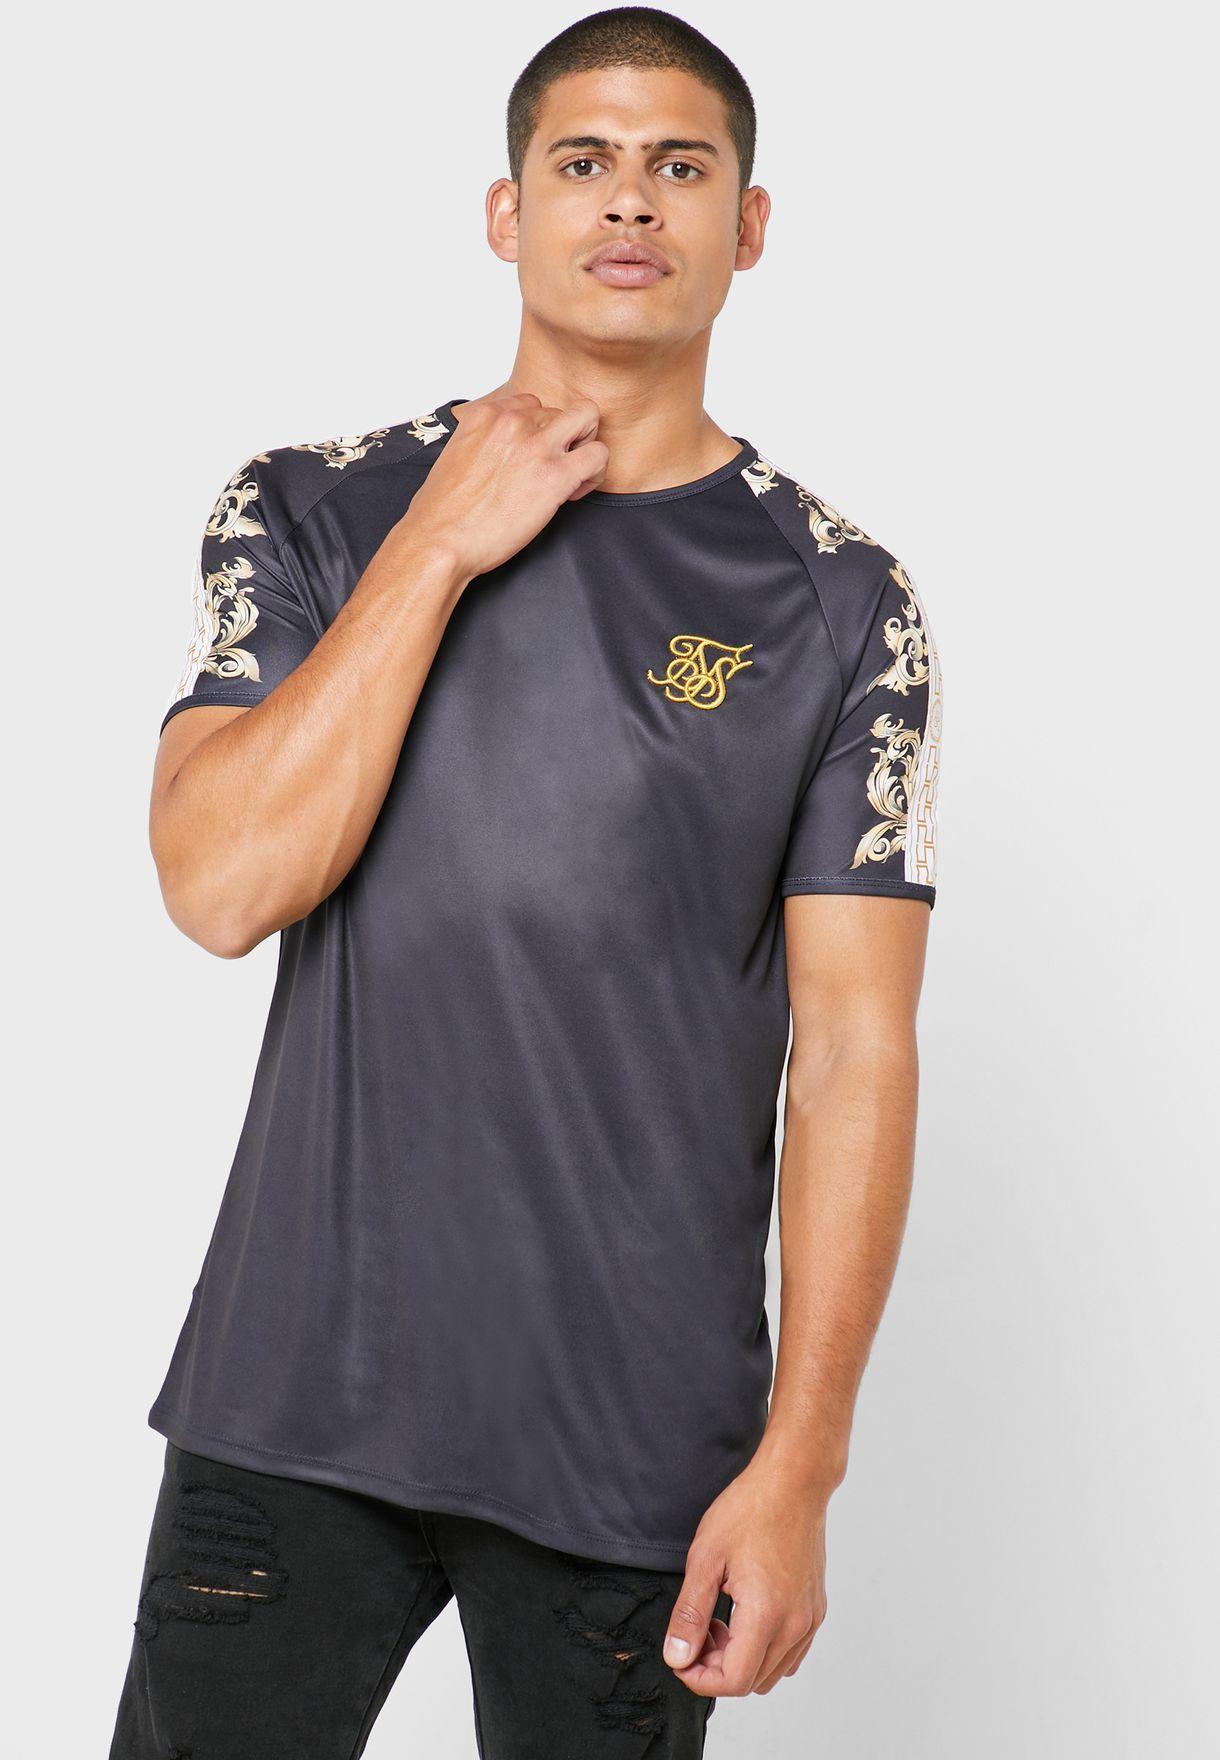 Raglan Gym T-Shirt